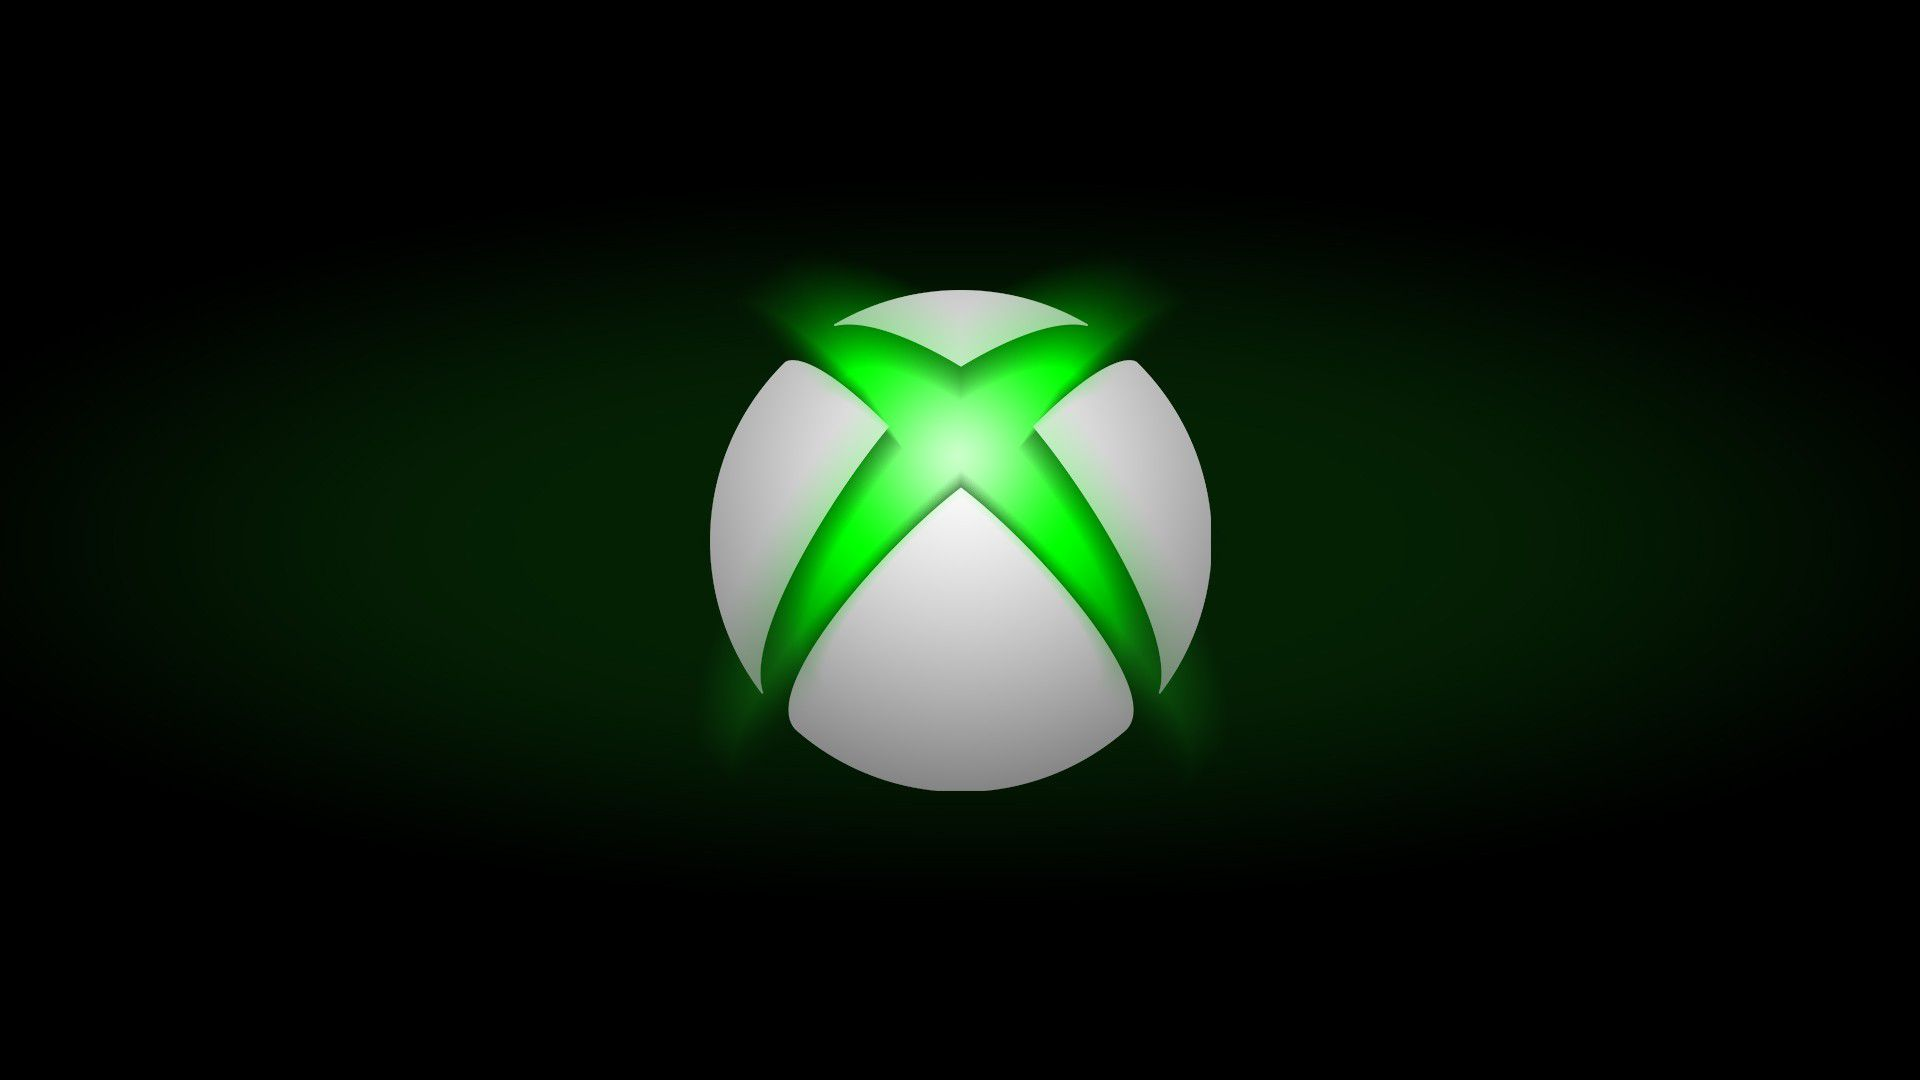 Xbox Wallpaper 20